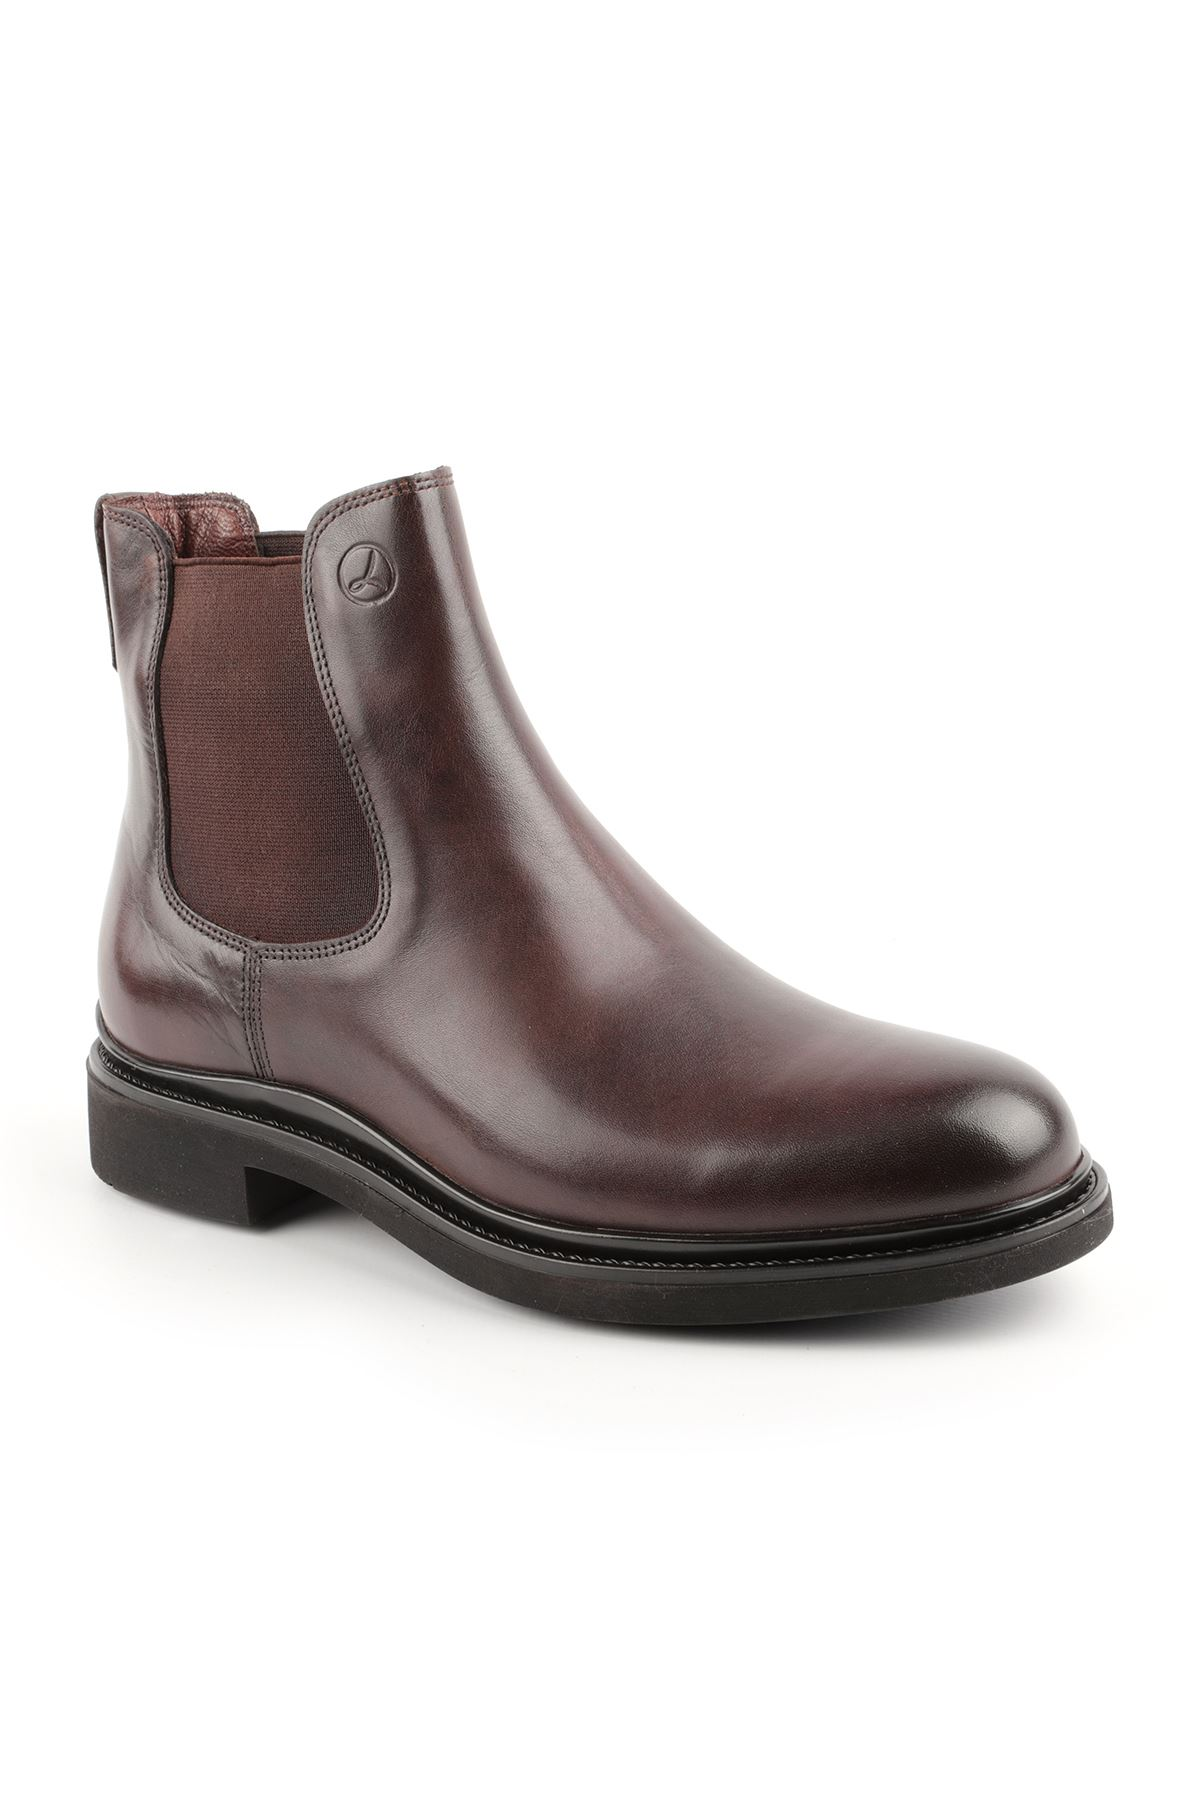 Libero L3454 Brown Leather Boot